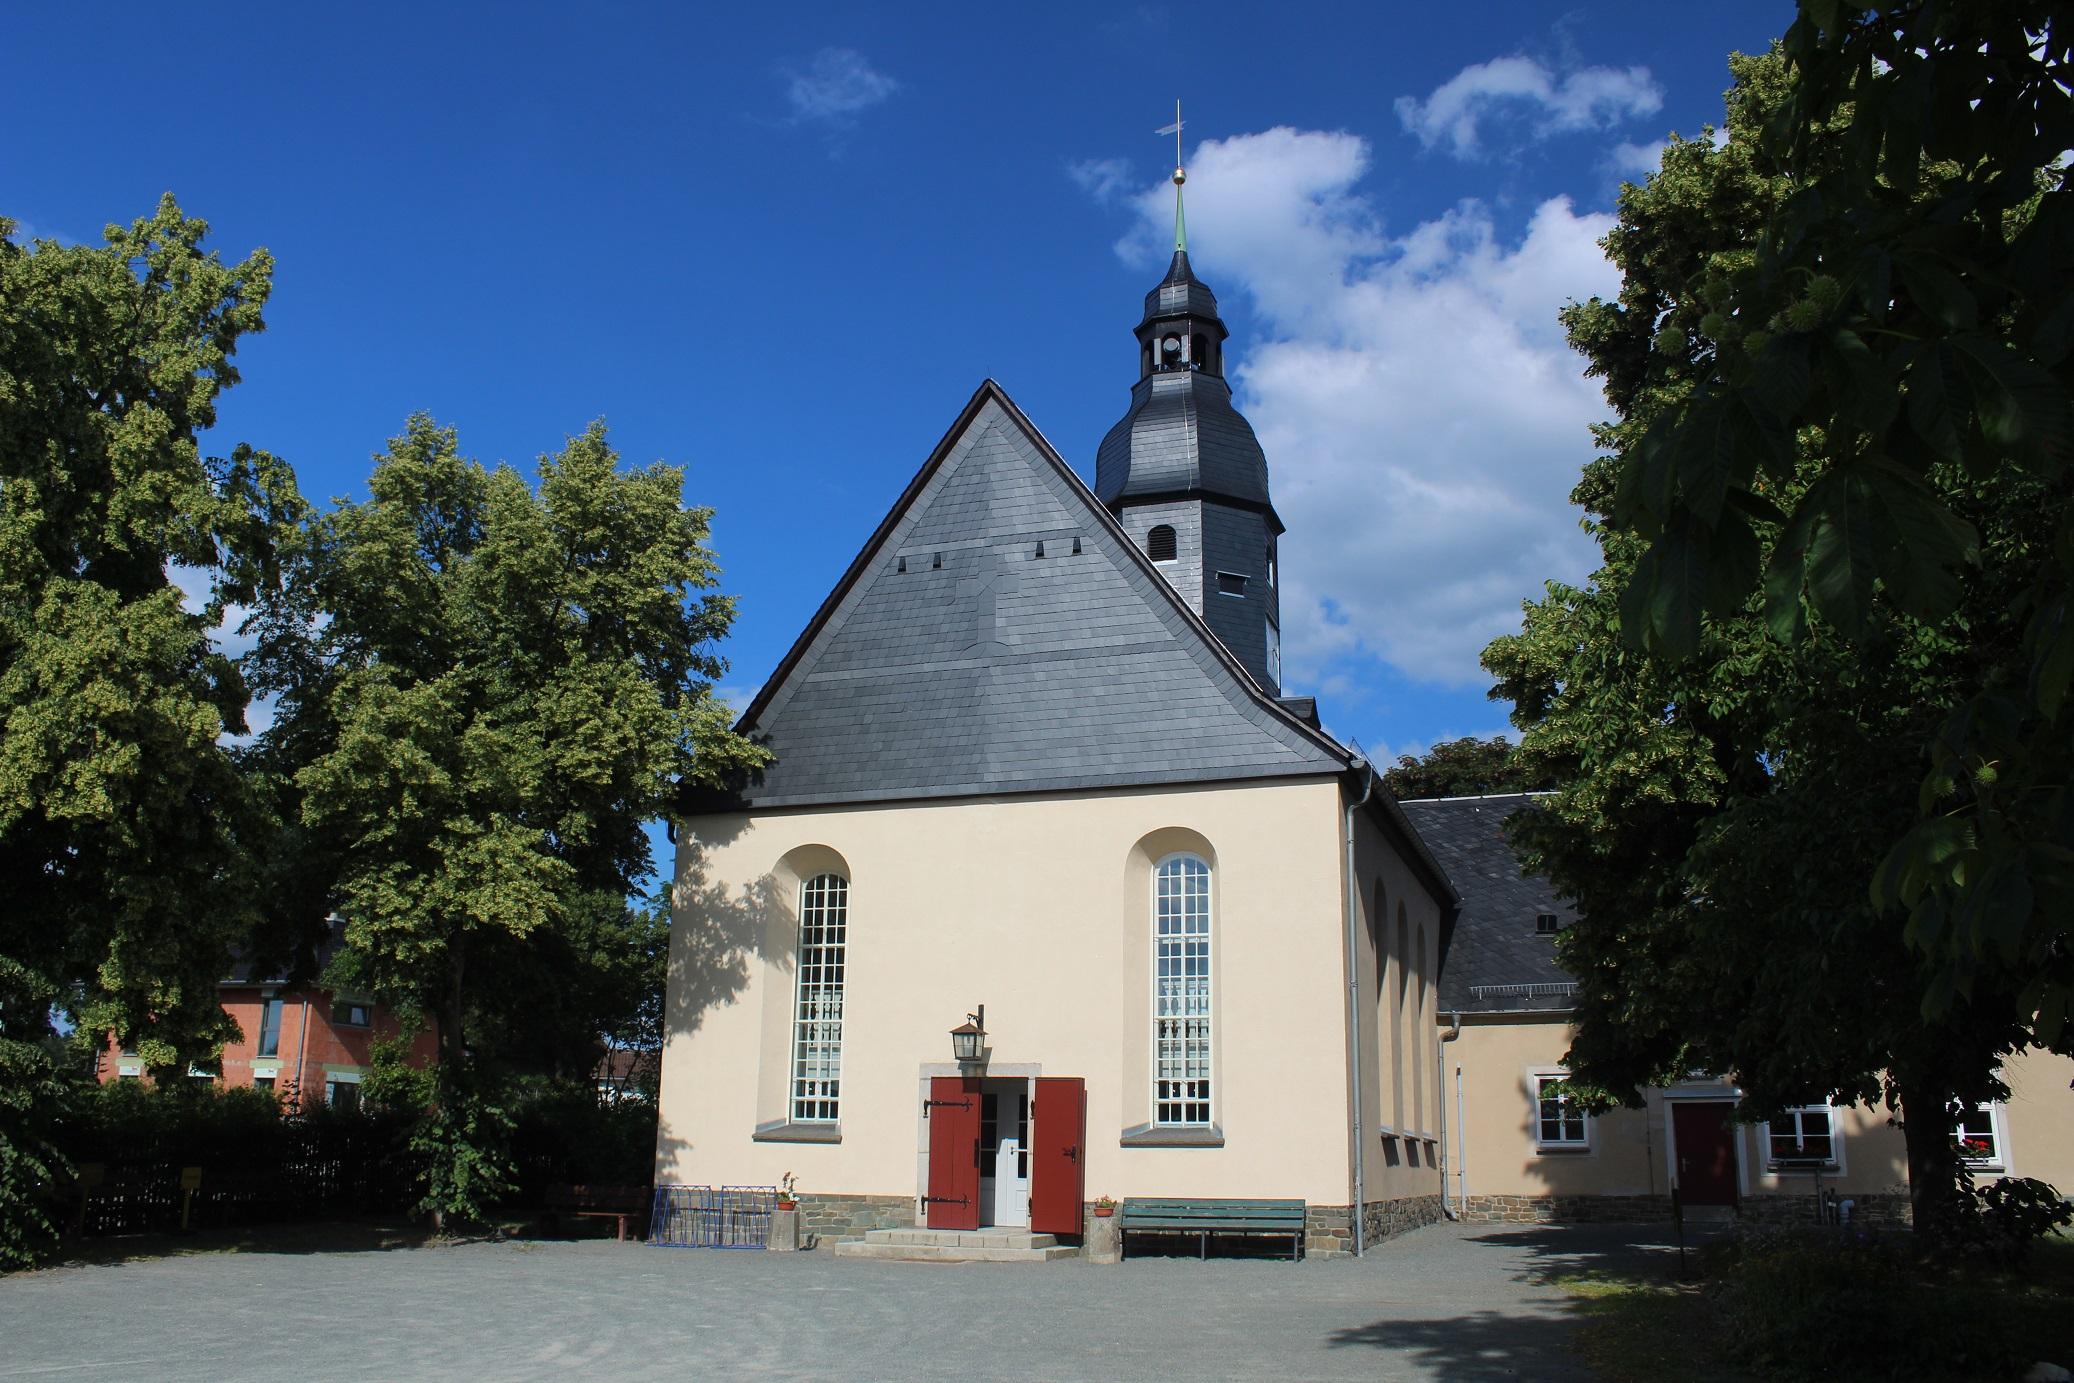 Dreifaltigkeitskirche Jocketa